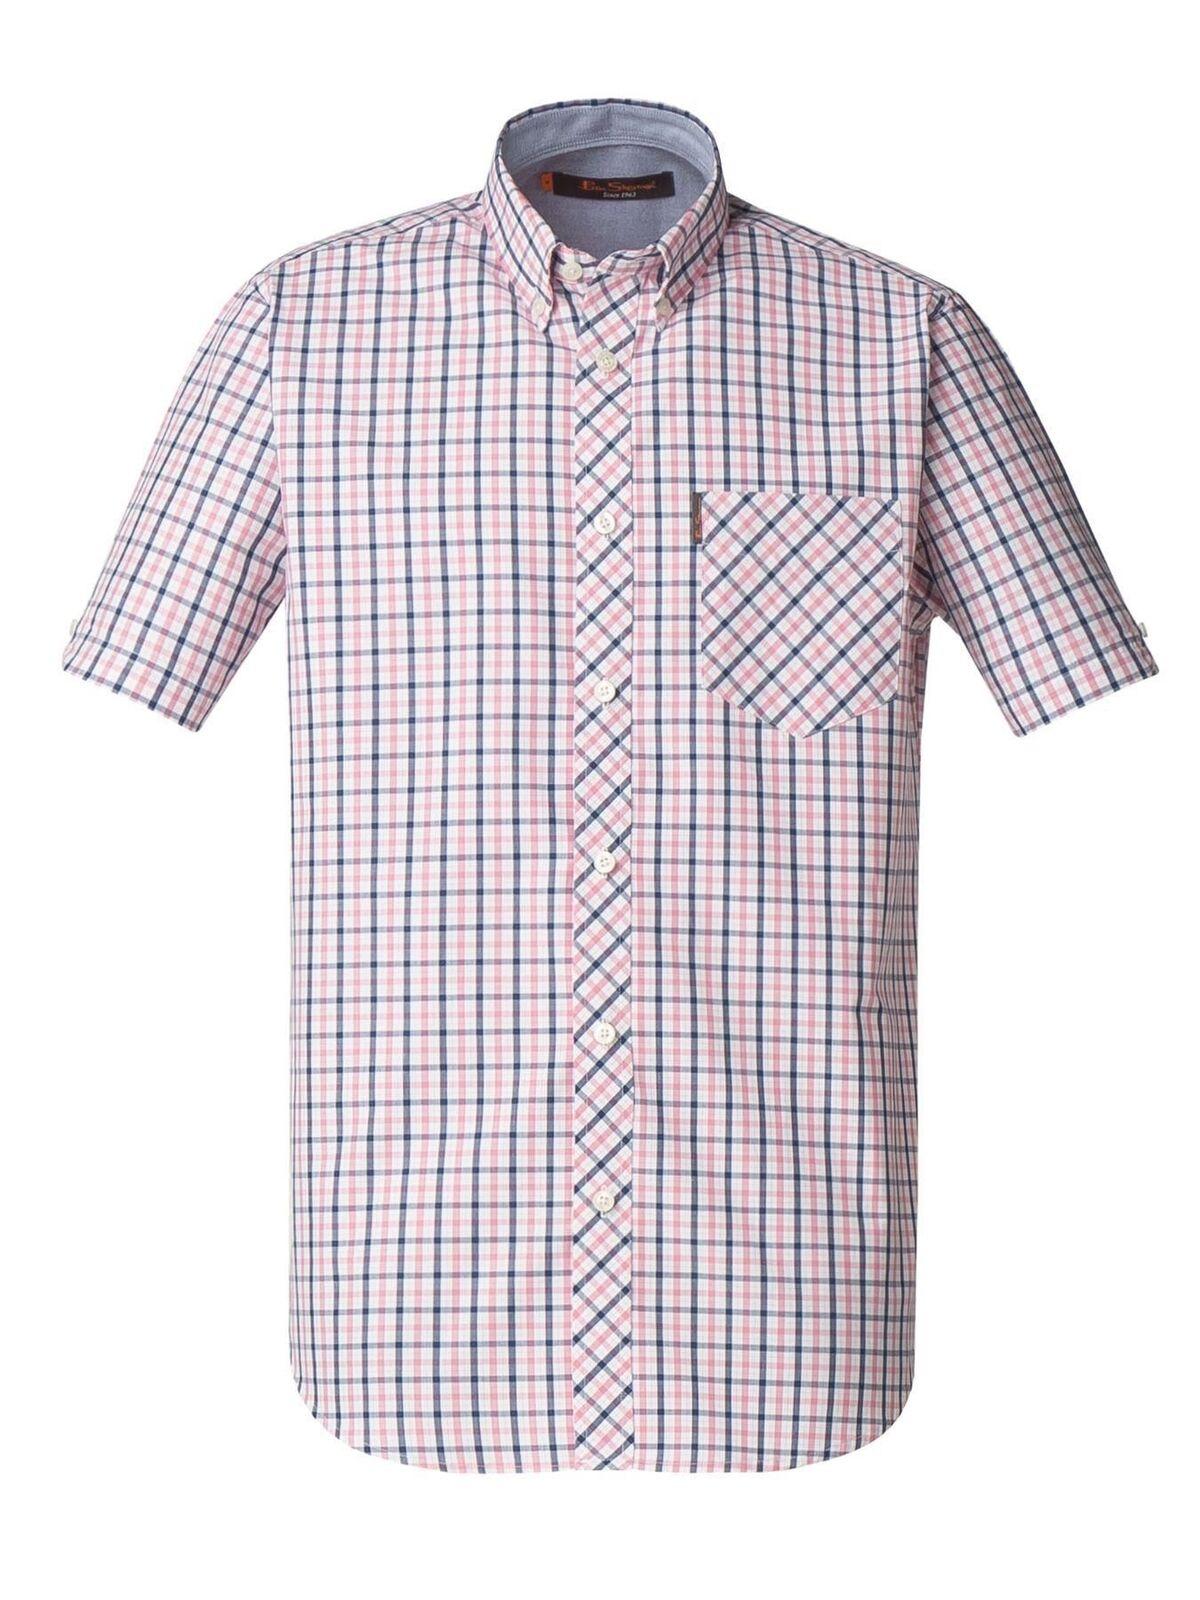 Ben Sherman Mens Big Size Short Sleeved Patterned Shirts (AW18)